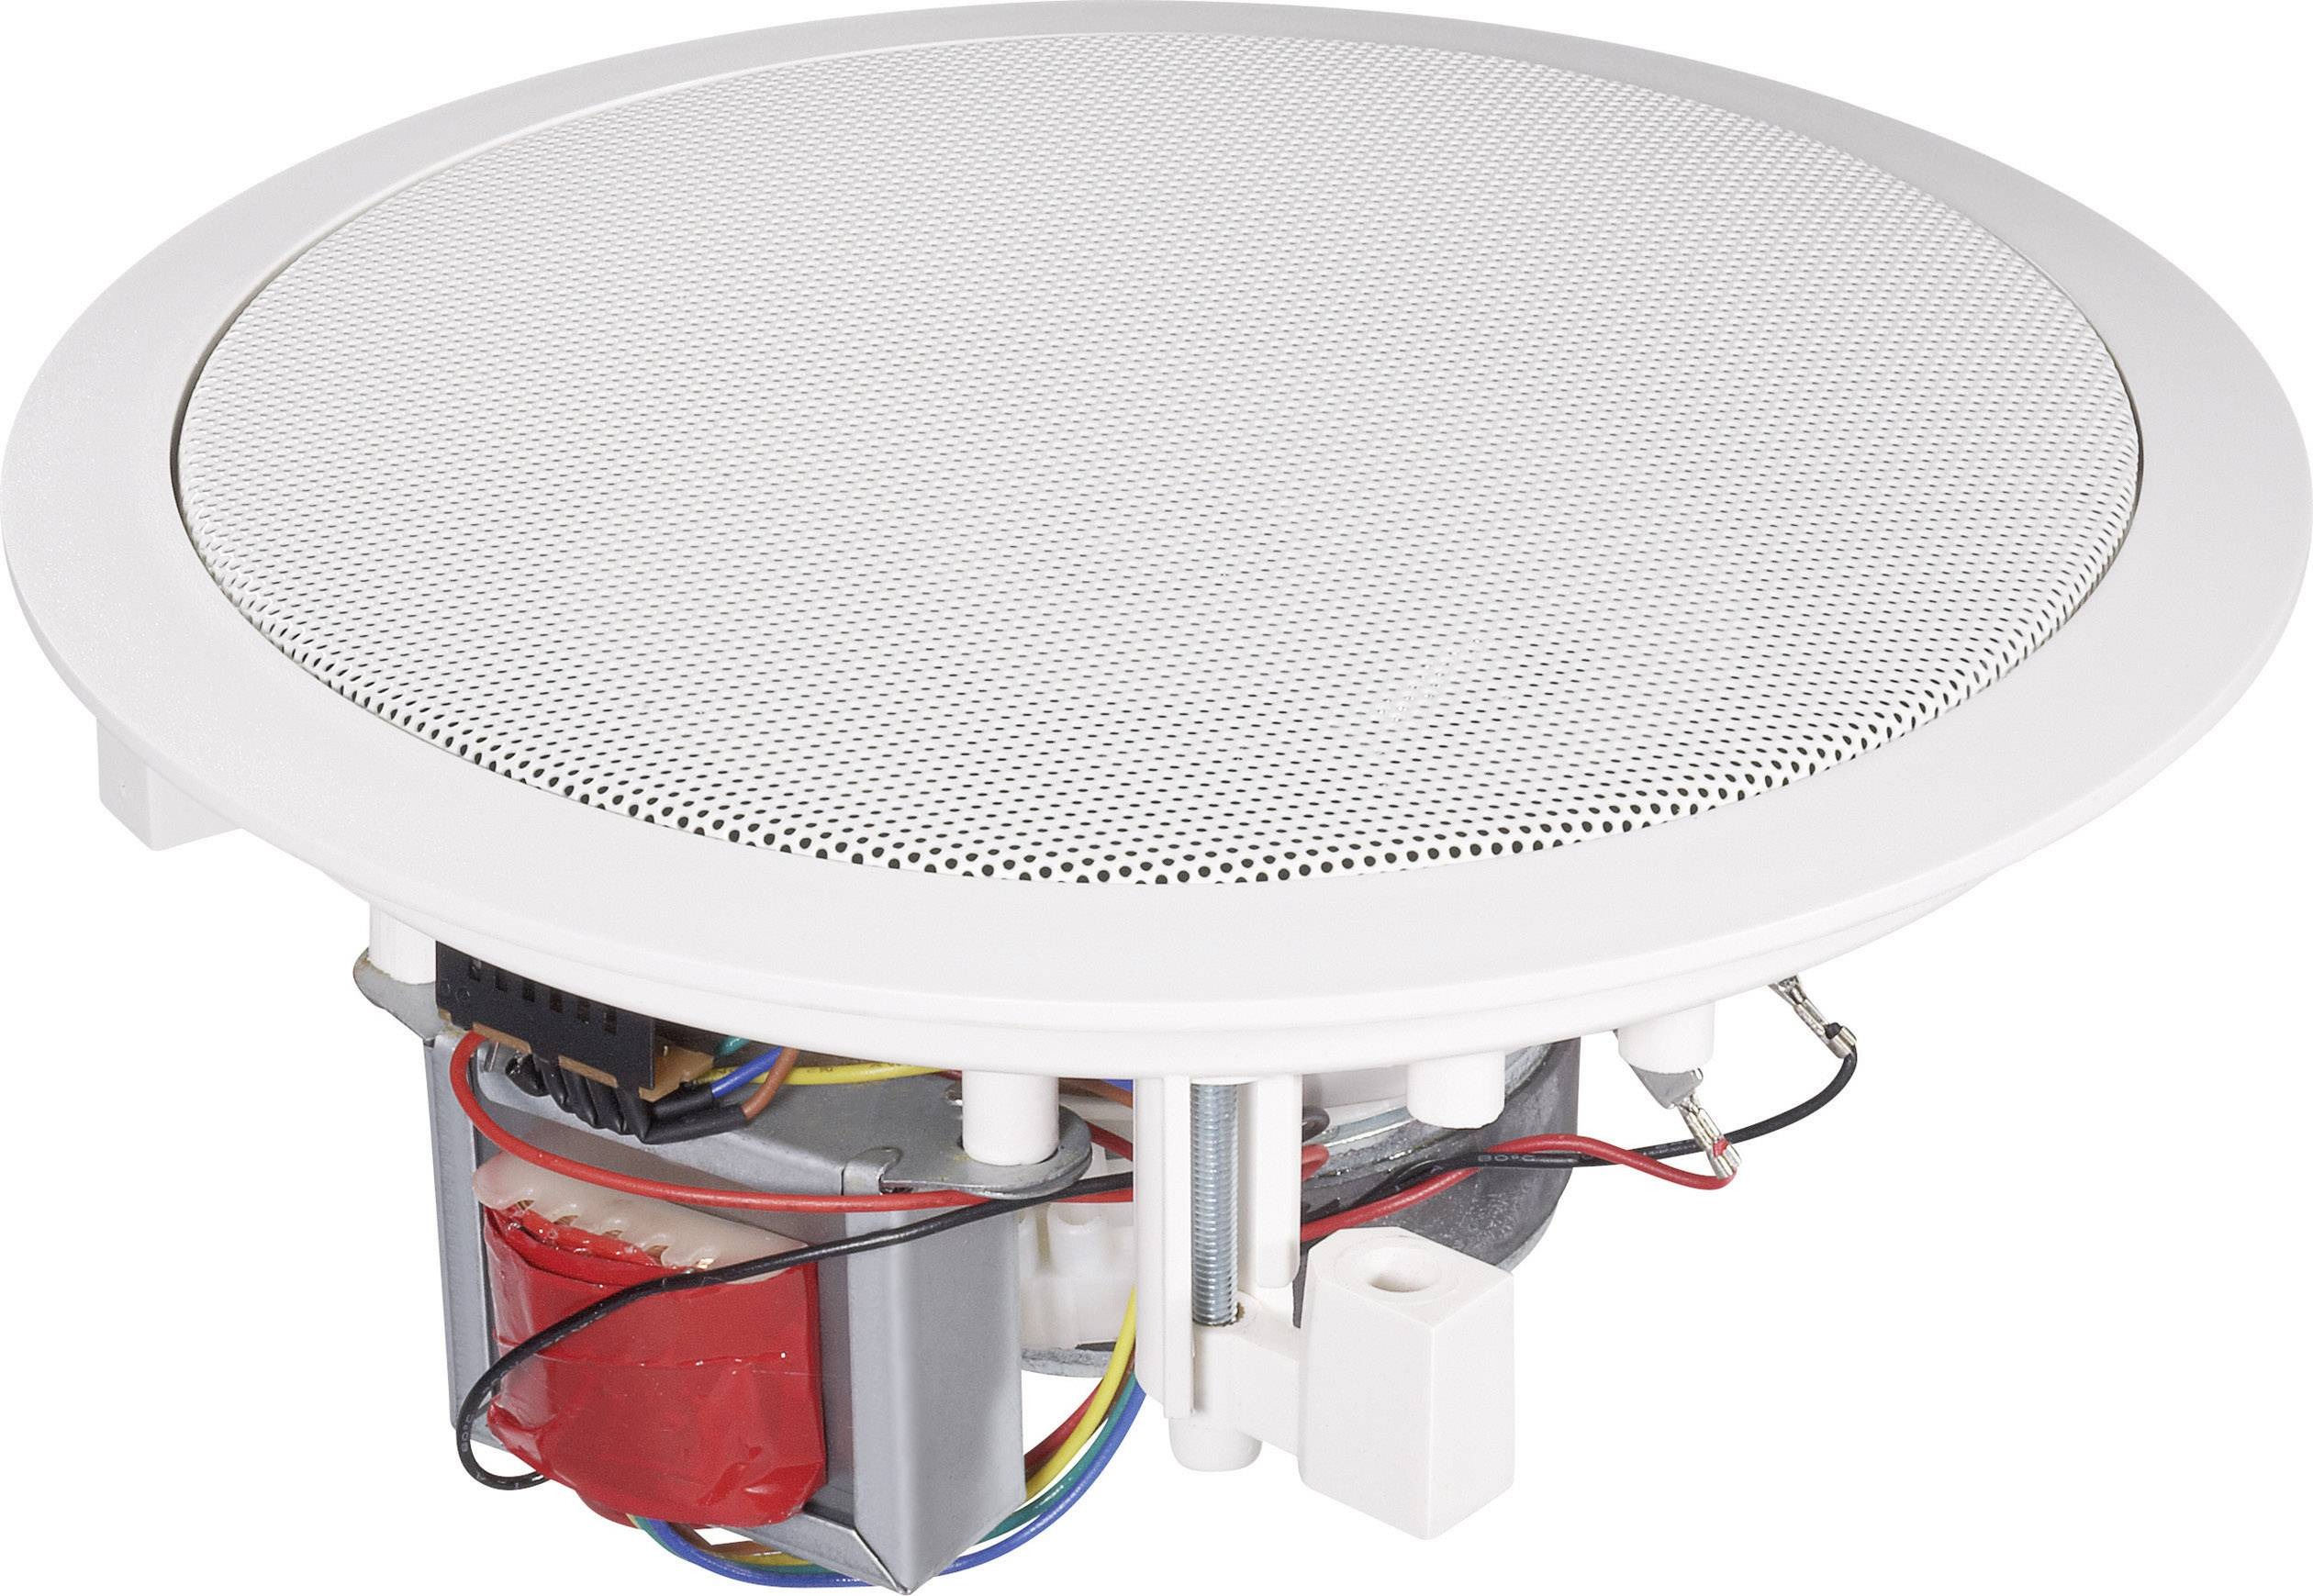 Stropní reproduktor ELA 160 mm , 8 Ω, 87 dB, 30/80 W